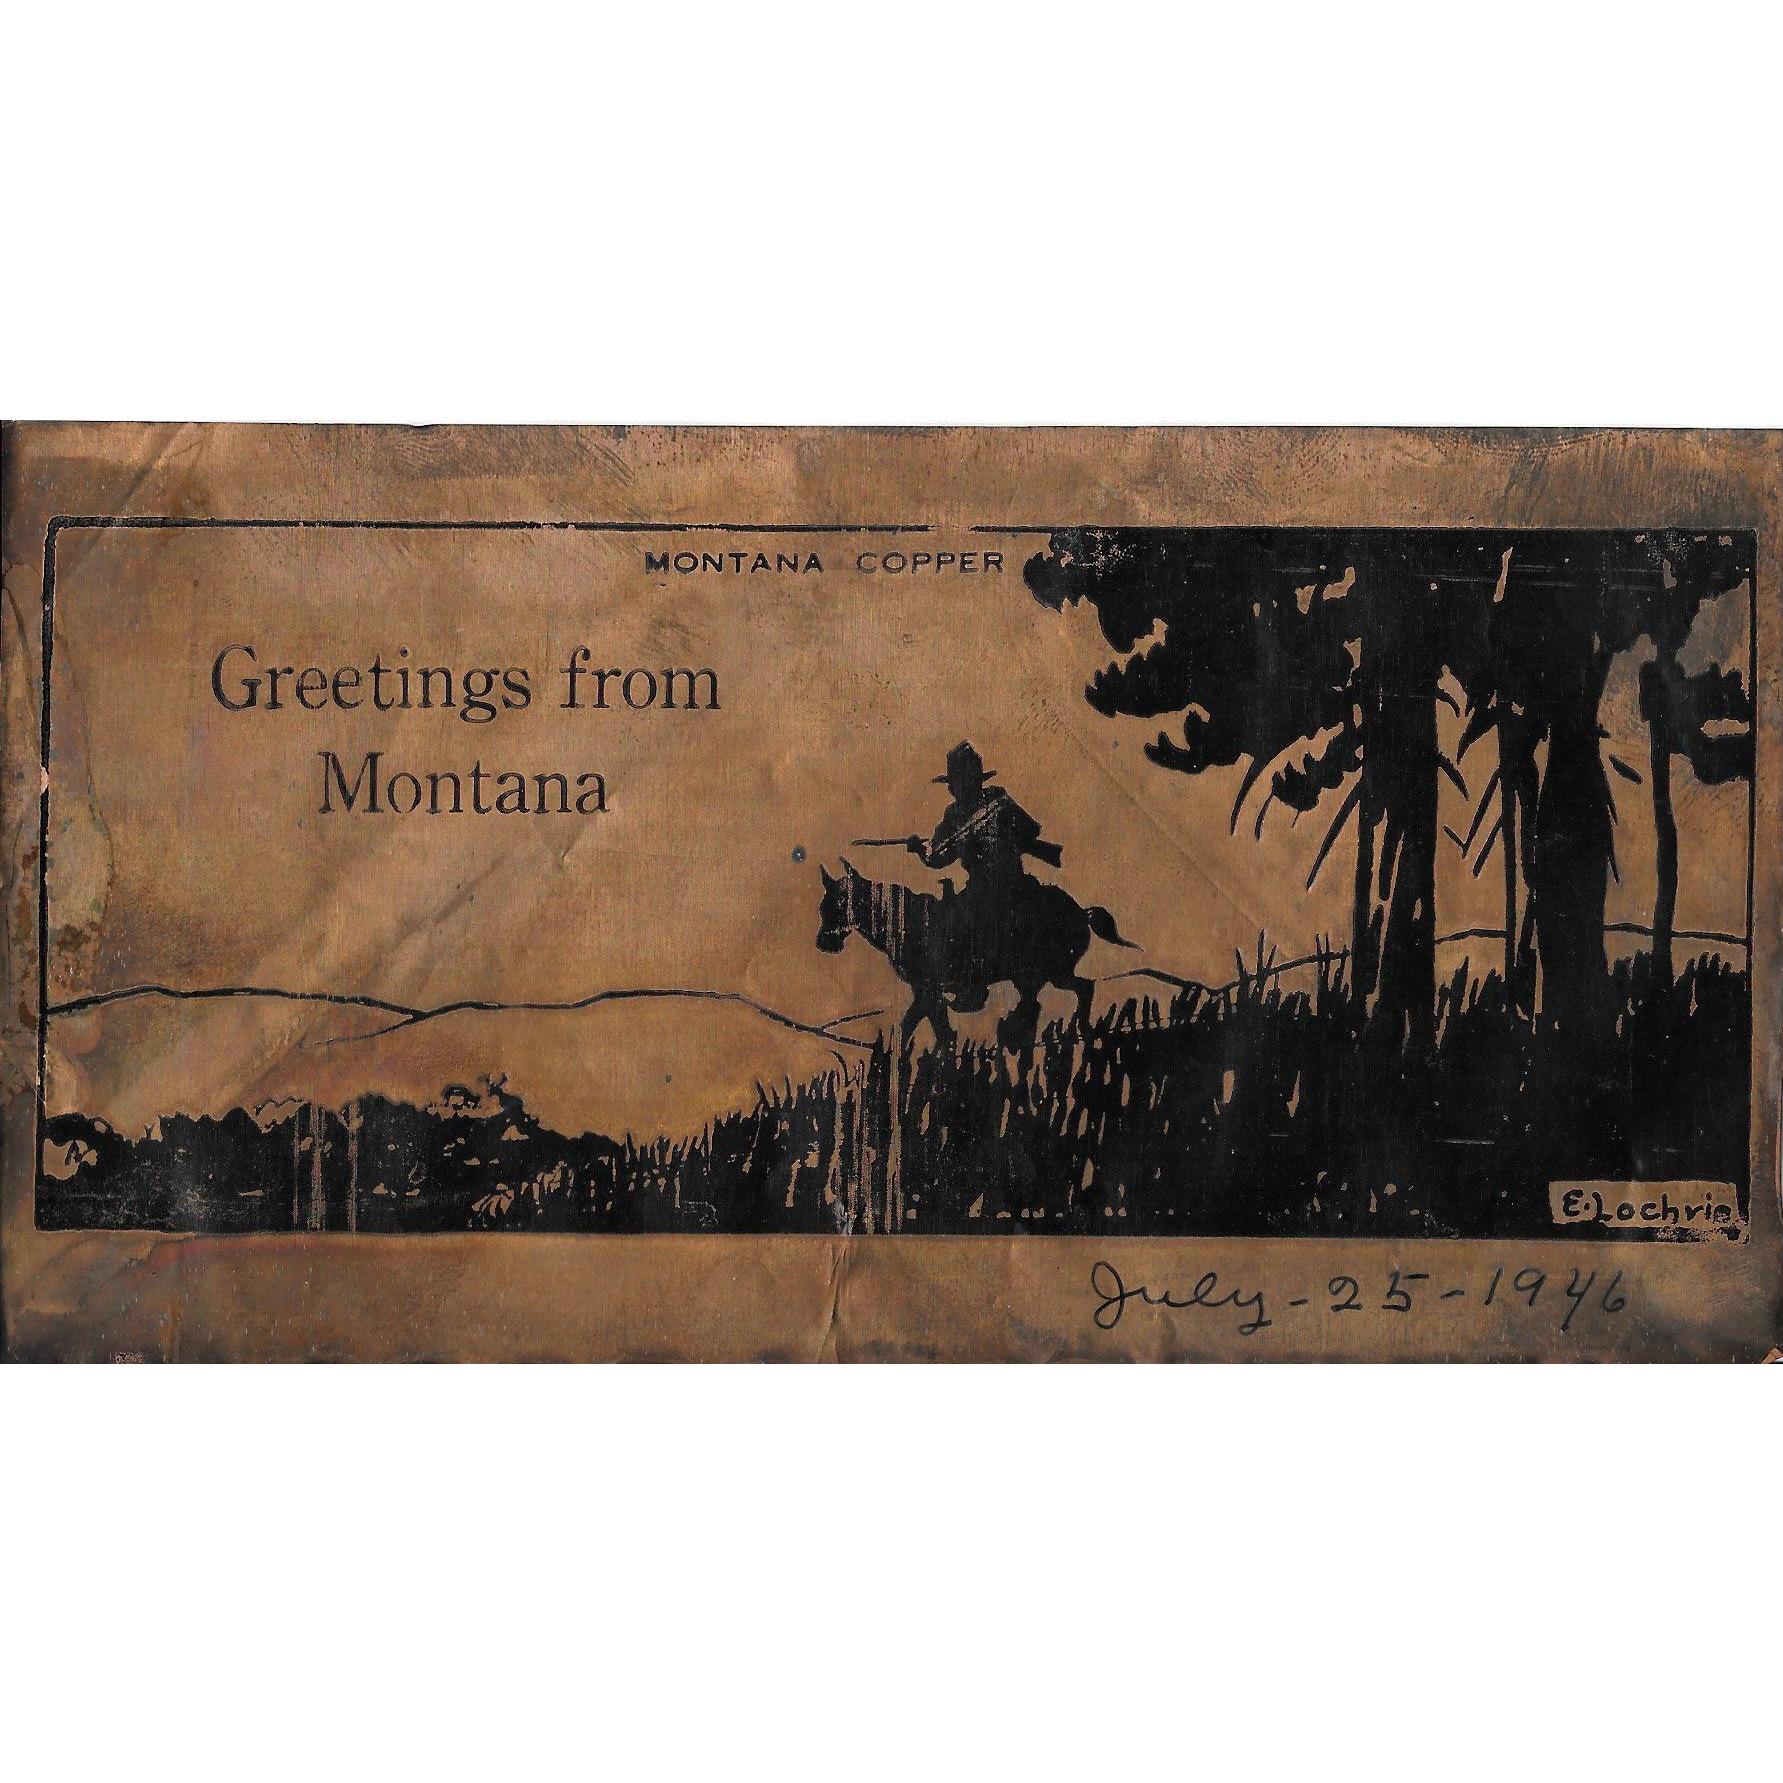 Vintage 1946 Montana Copper Foil Postcard E. Lochrie Image Scenic